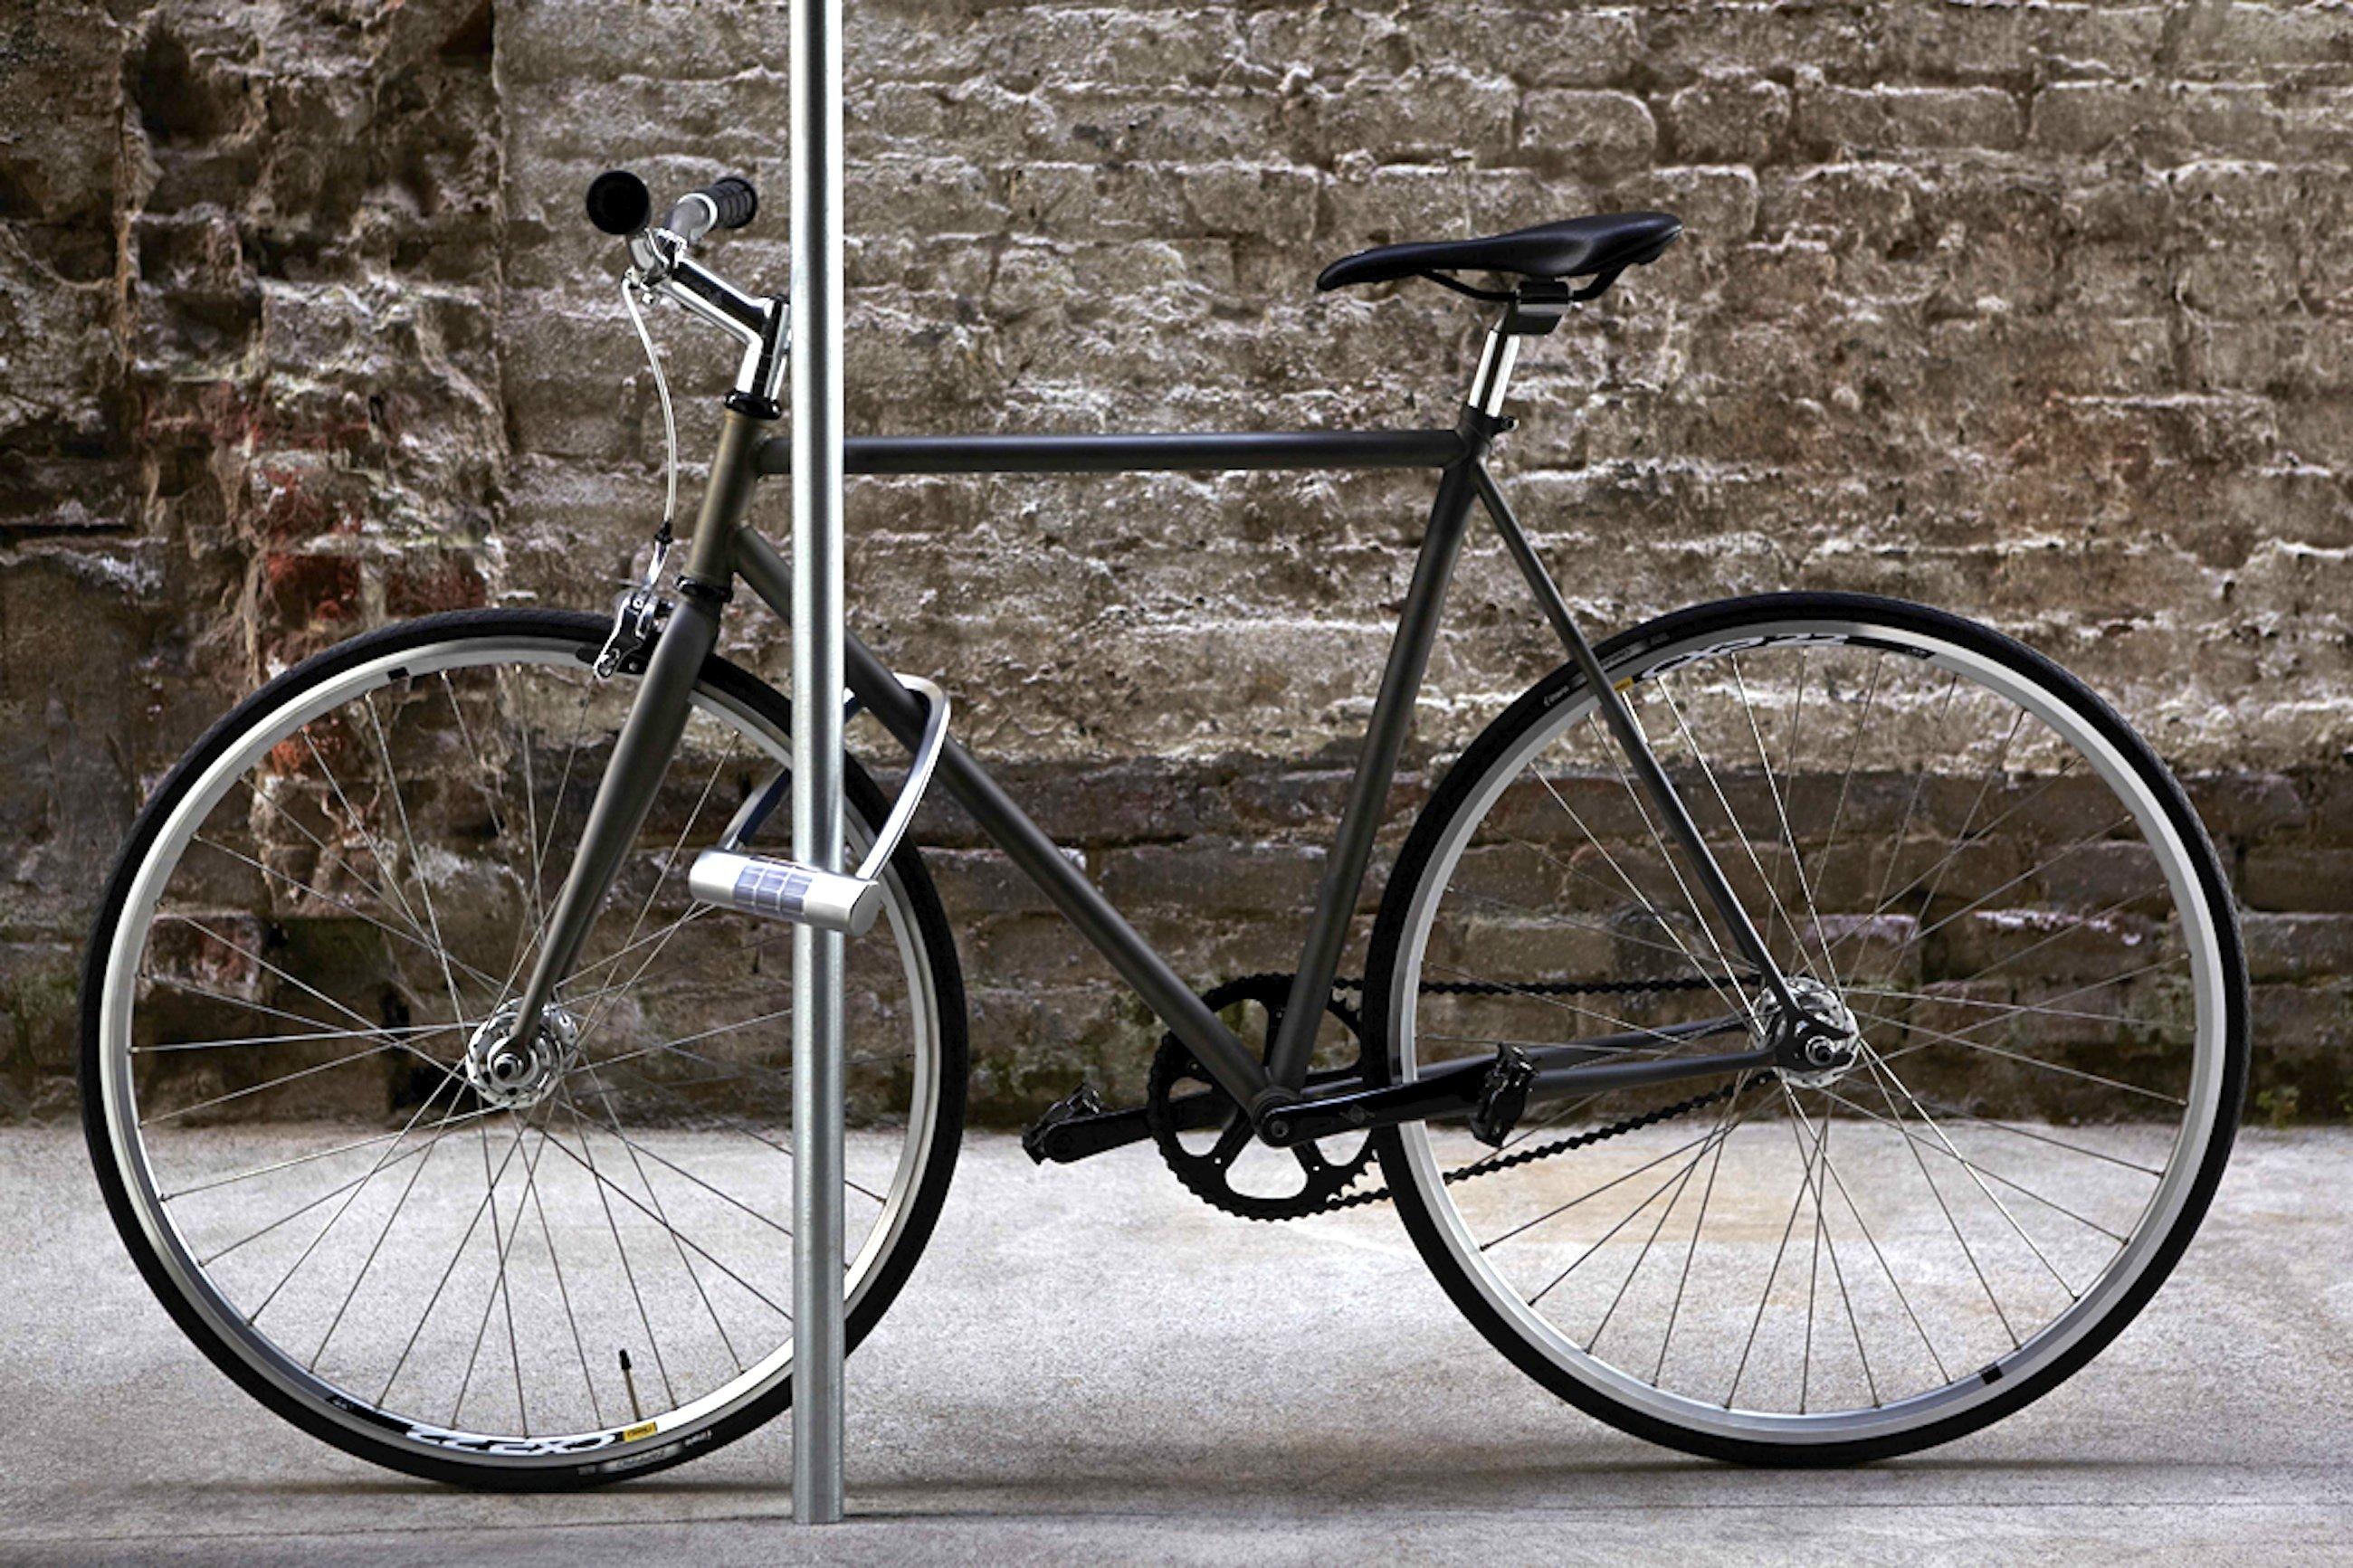 Dieses Fahrradschloss bringt Diebe zum Kotzen - ingenieur.de